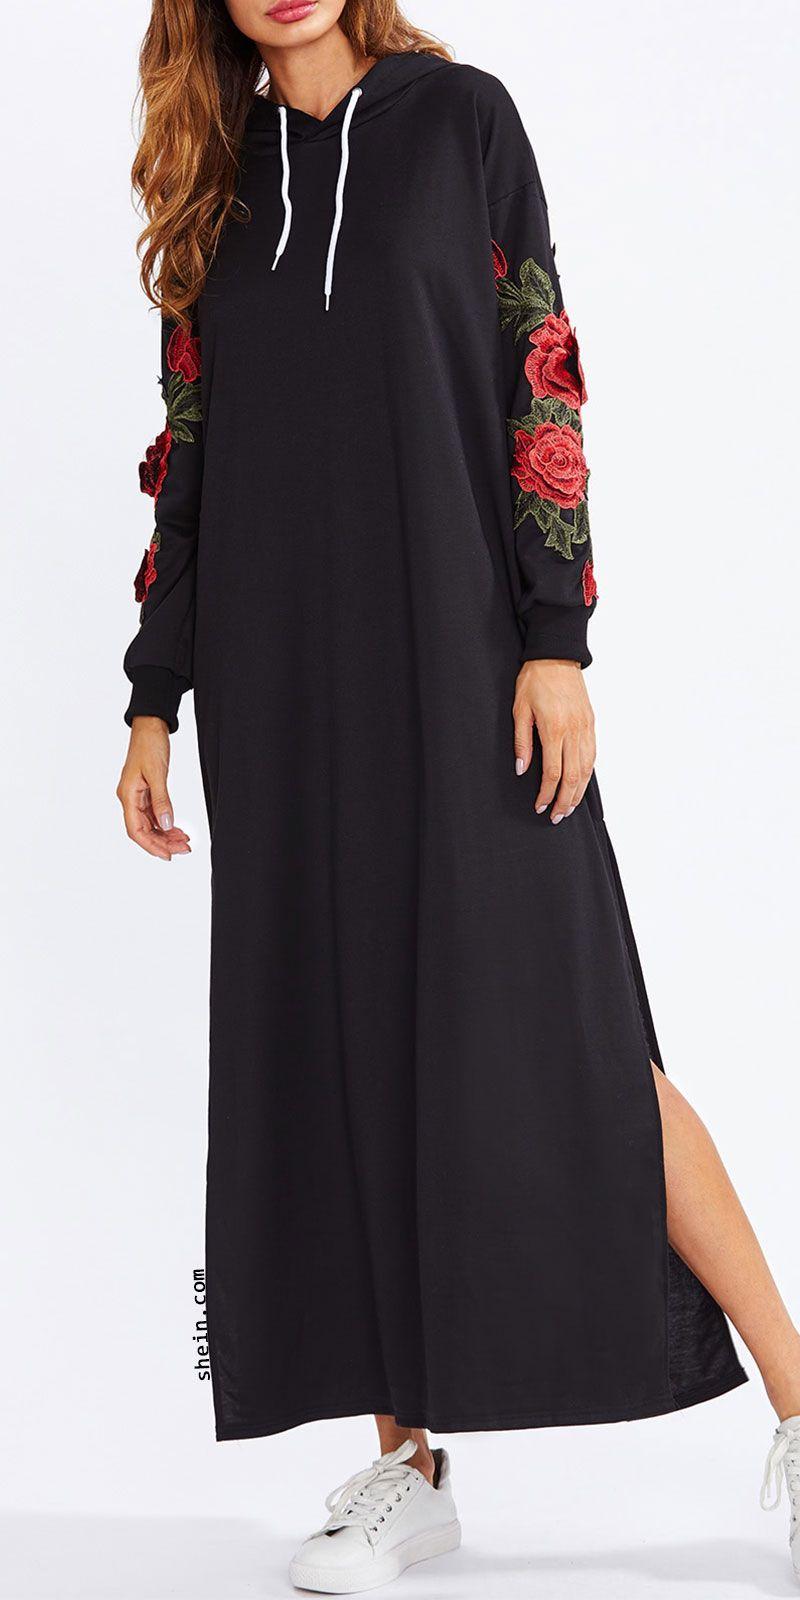 Split side applique hooded dress ropa pinterest hooded dress